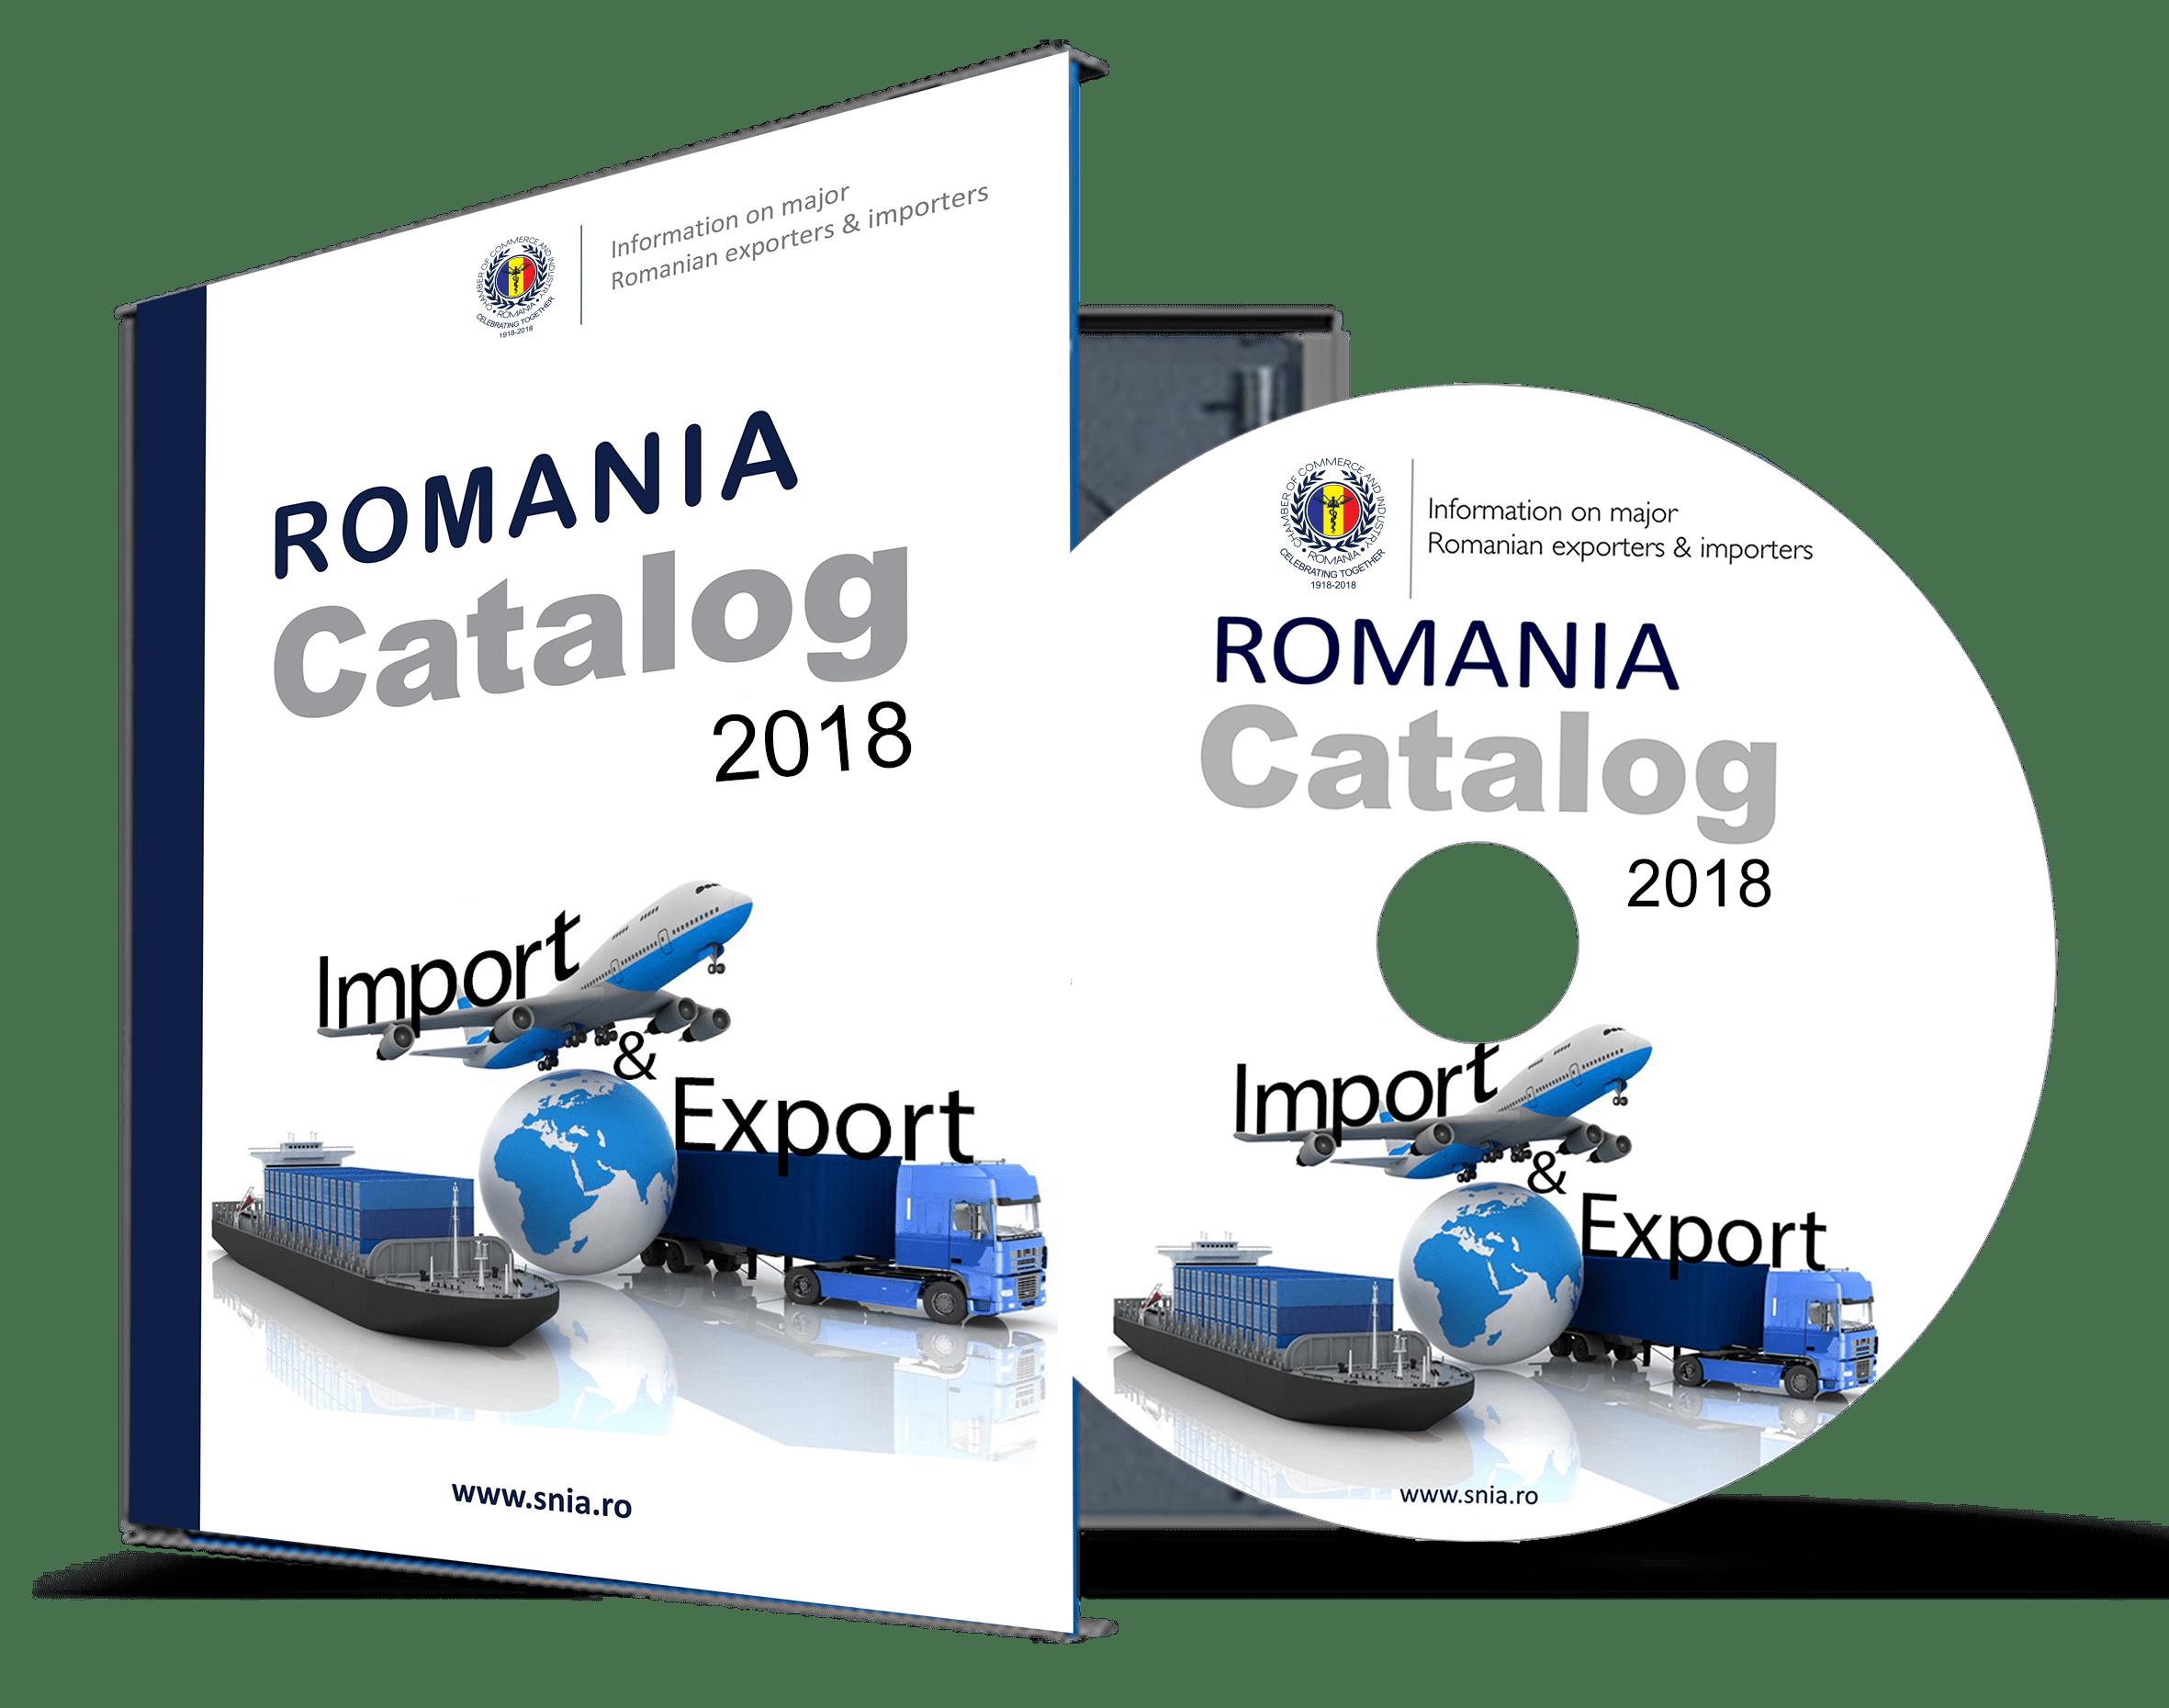 ok-coperta-CD-si-Eticheta-pt-site-CATAGOL-EXP-2016